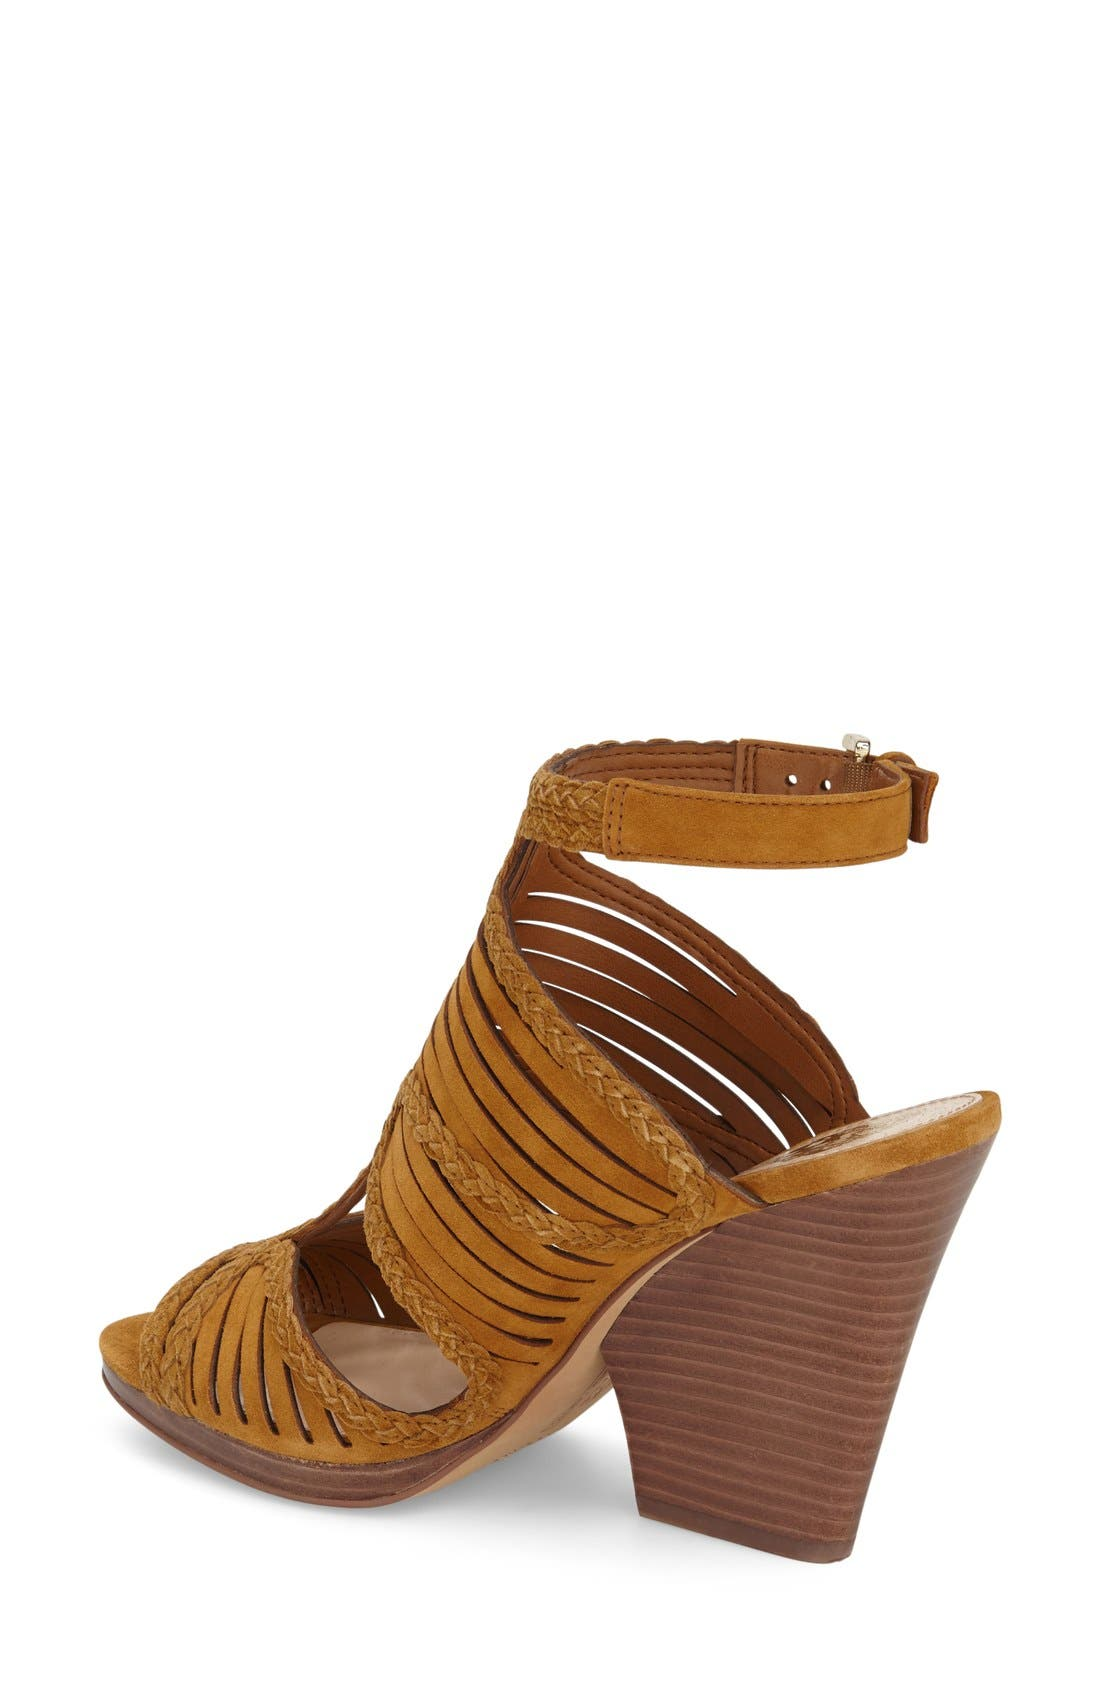 Alternate Image 2  - Vince Camuto 'Janil' Sandal (Women) (Nordstrom Exclusive)